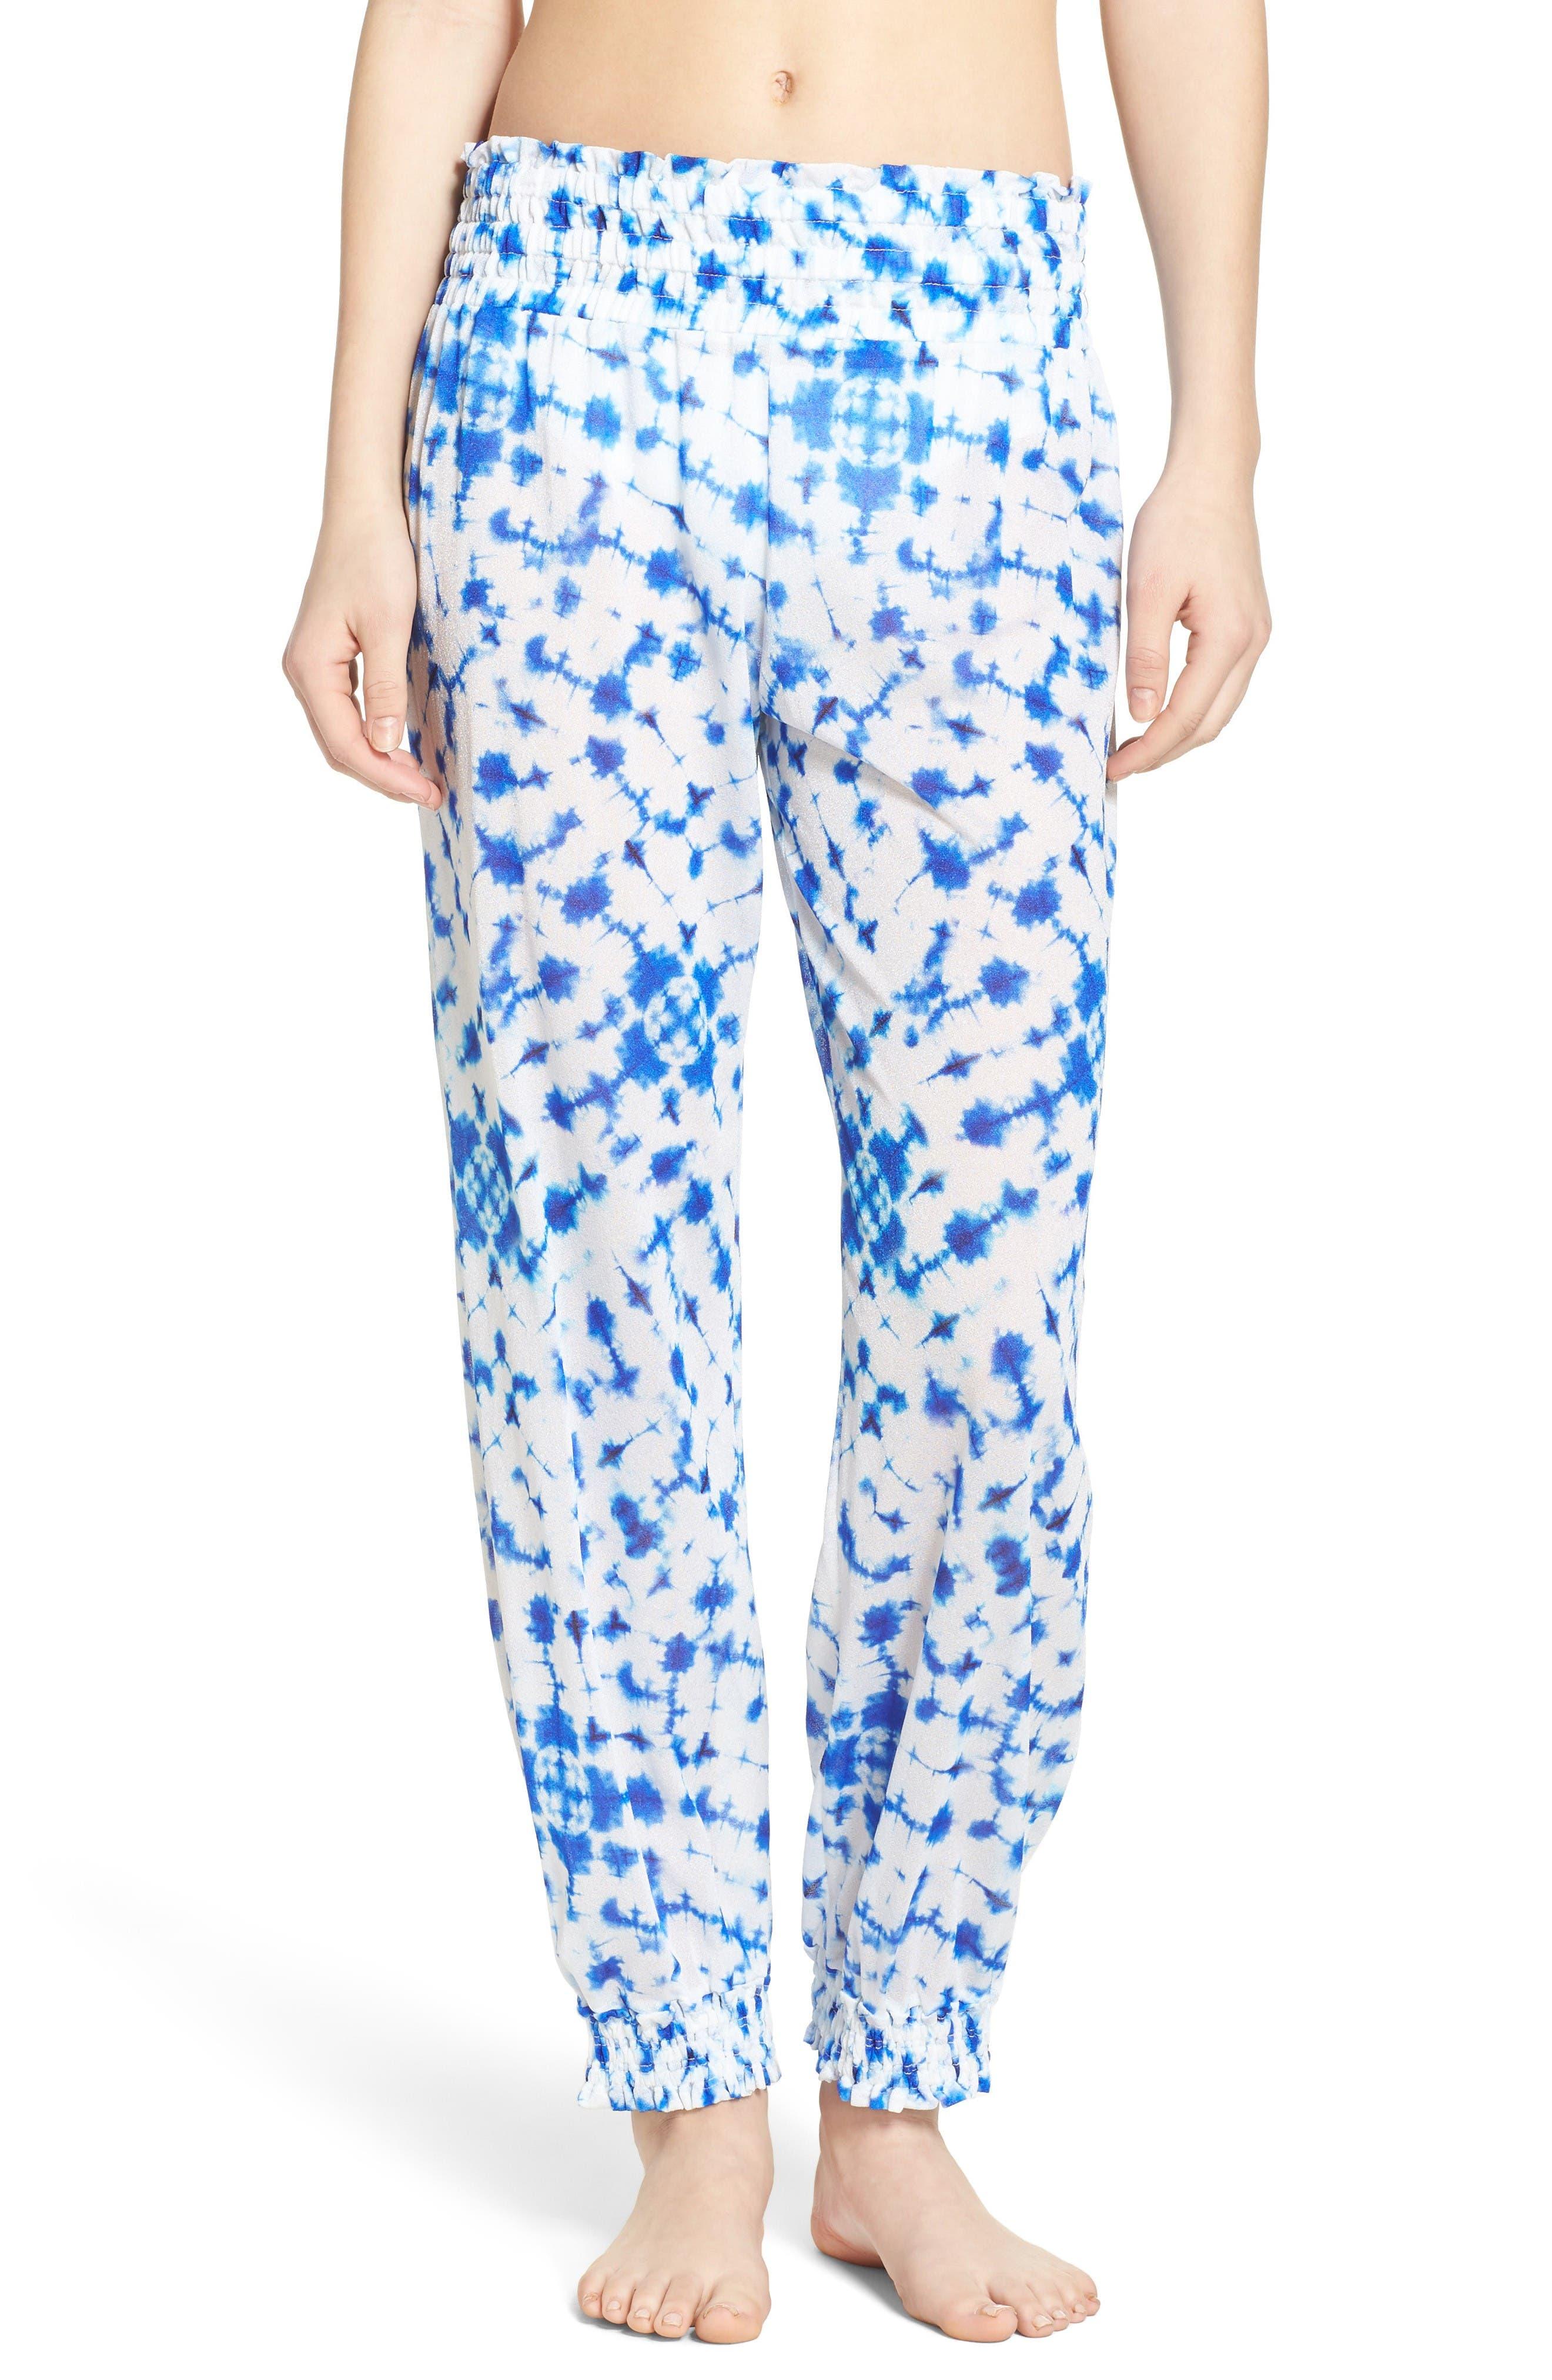 Luli Fama Print Cover-Up Pants